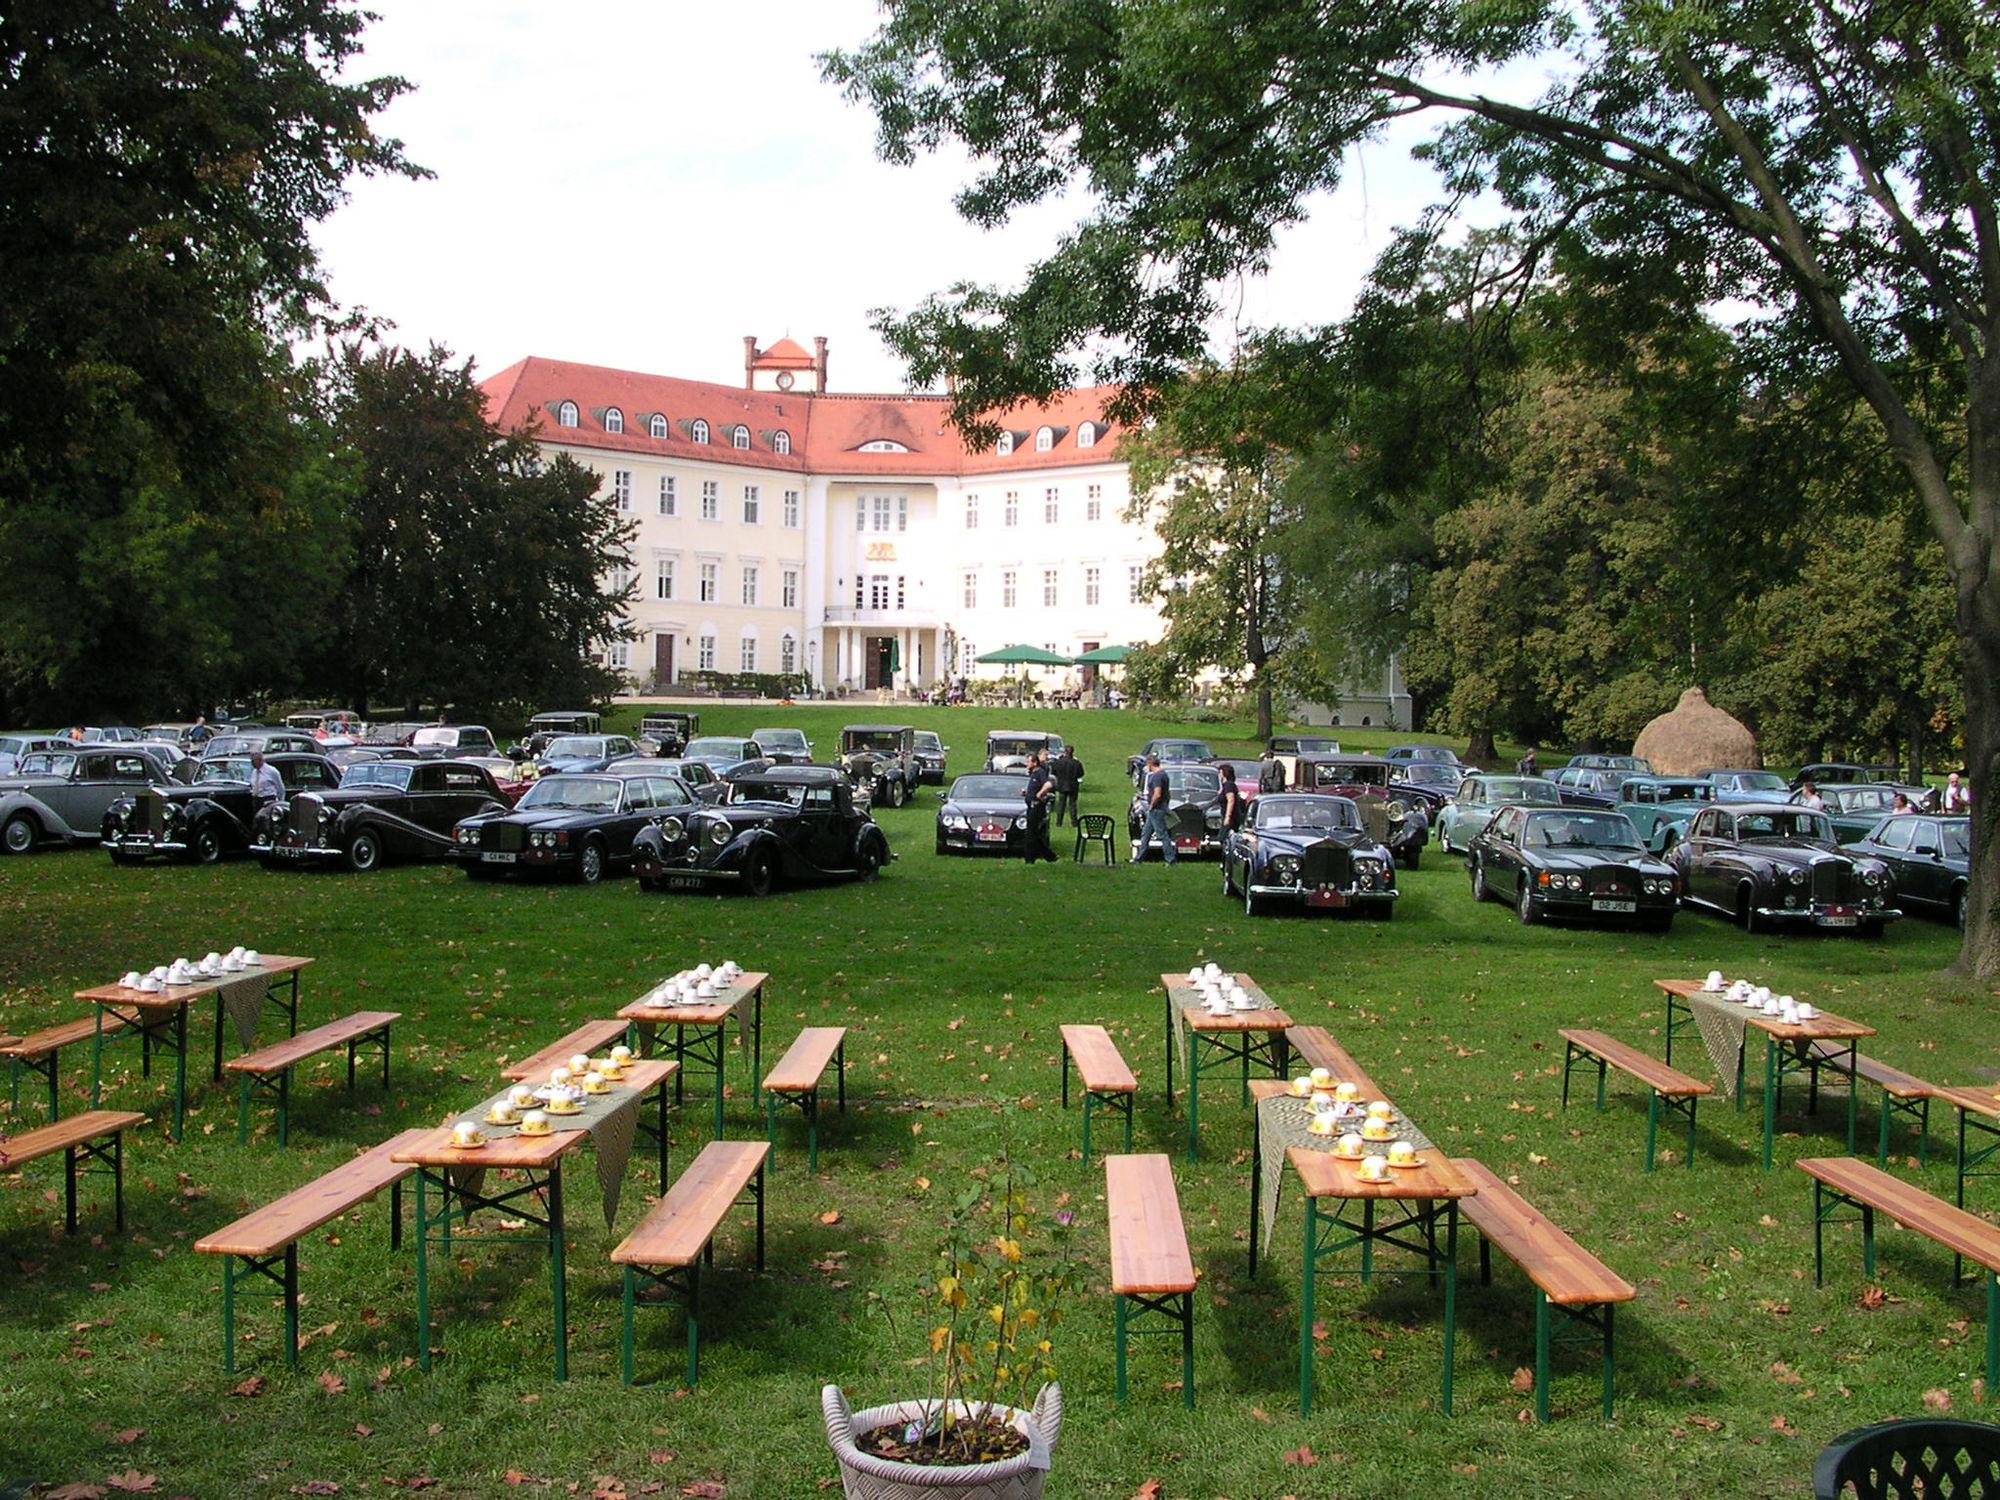 Hotel Spreewald - Urlaub im Schloss - Schlosshotel Brandenburg - Spreewald Arrangements - Schloss Lübbenau im Spreewald